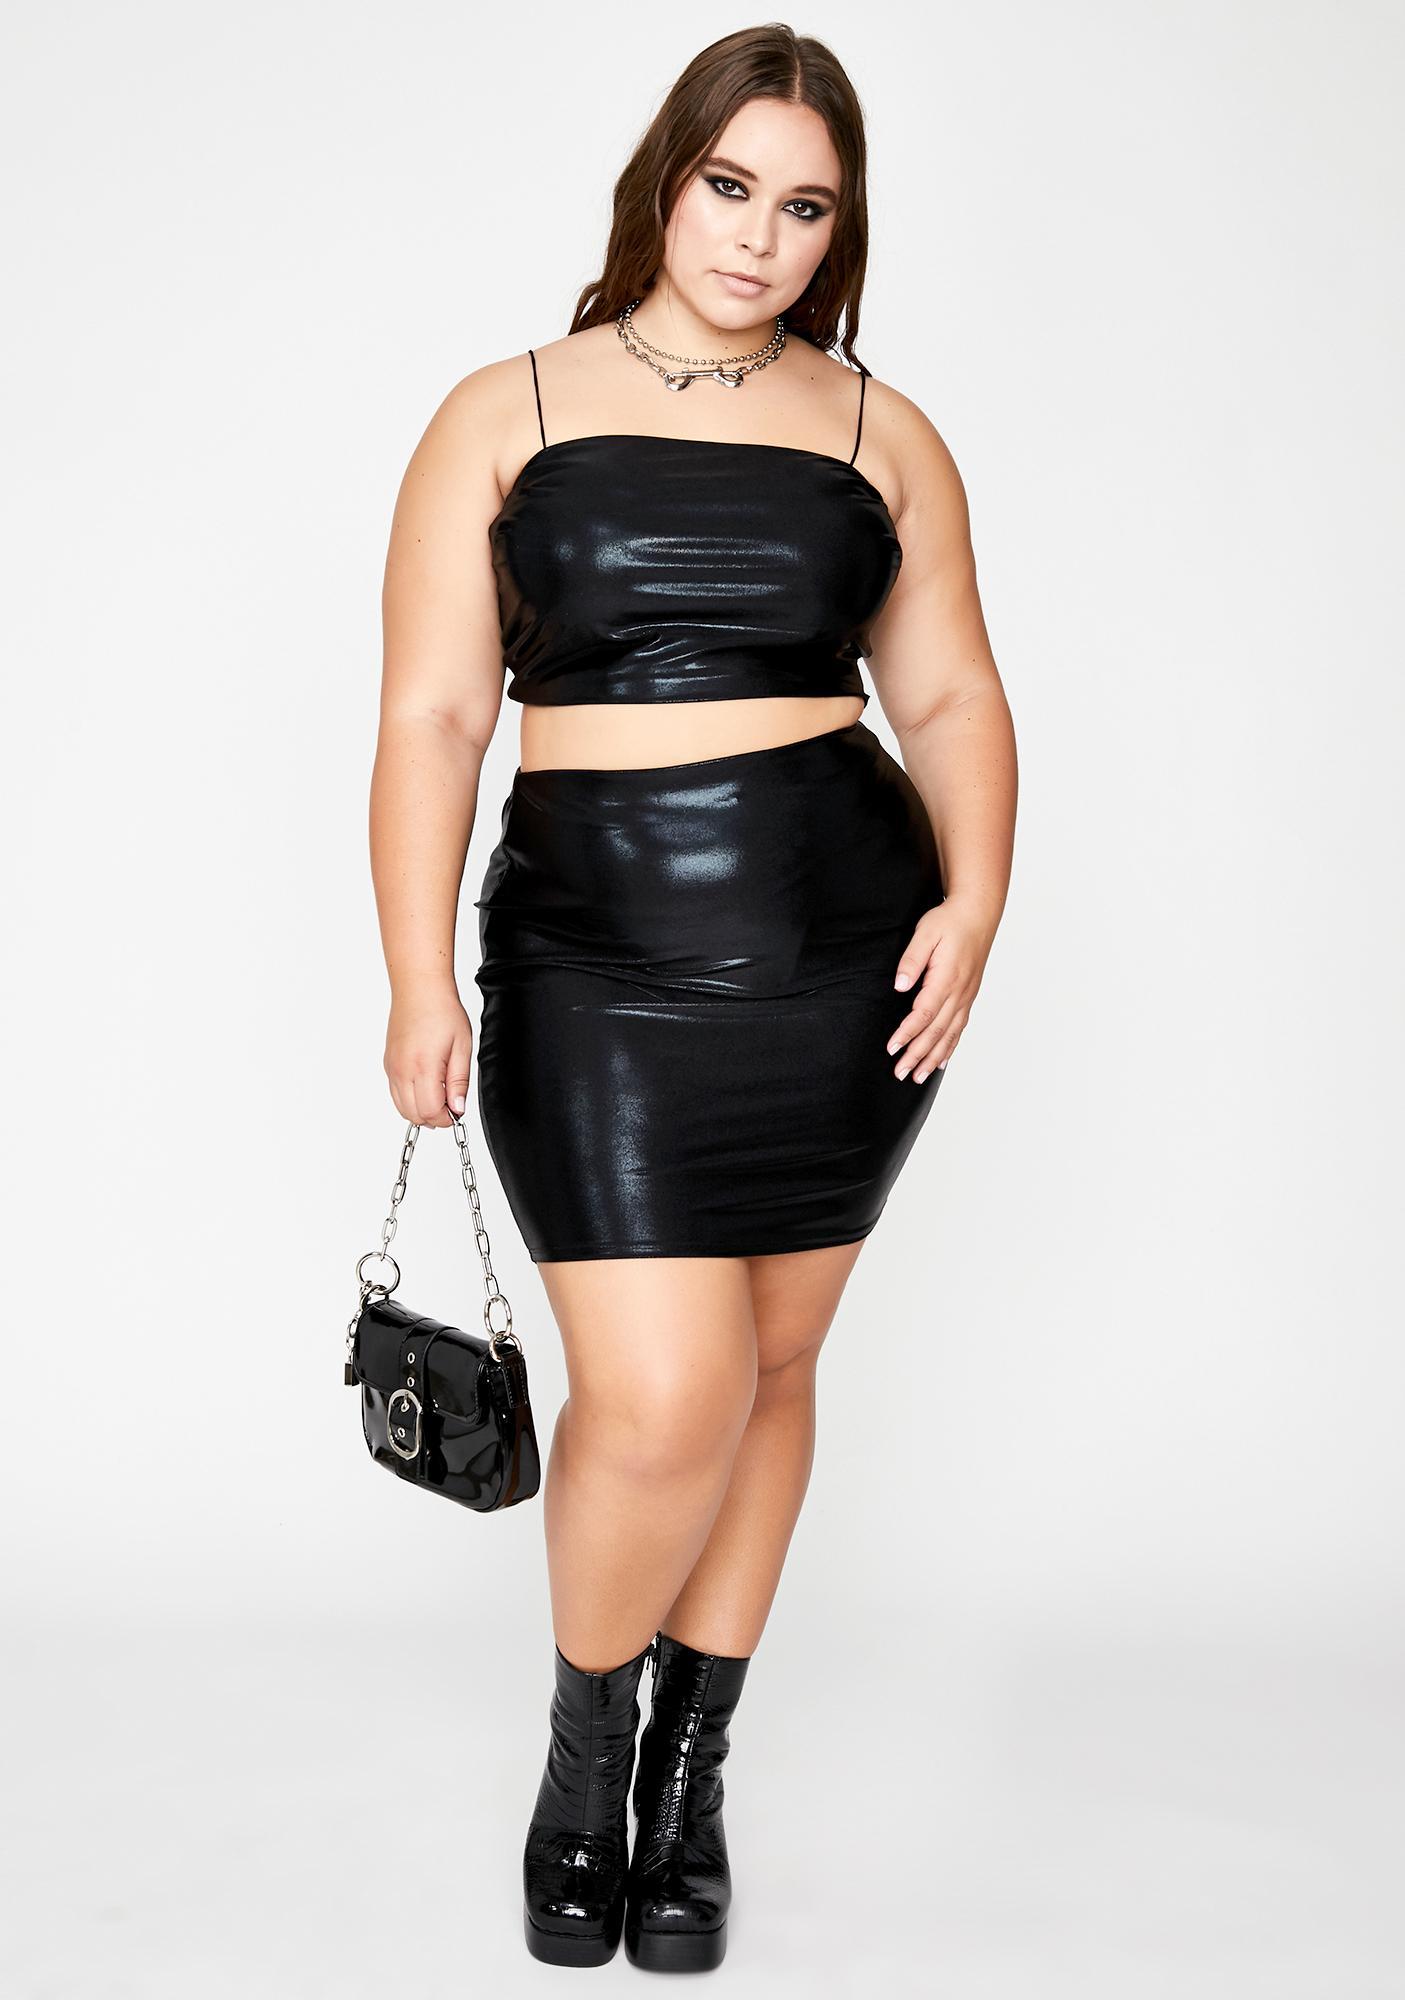 Dark Total Space Rave Skirt Set